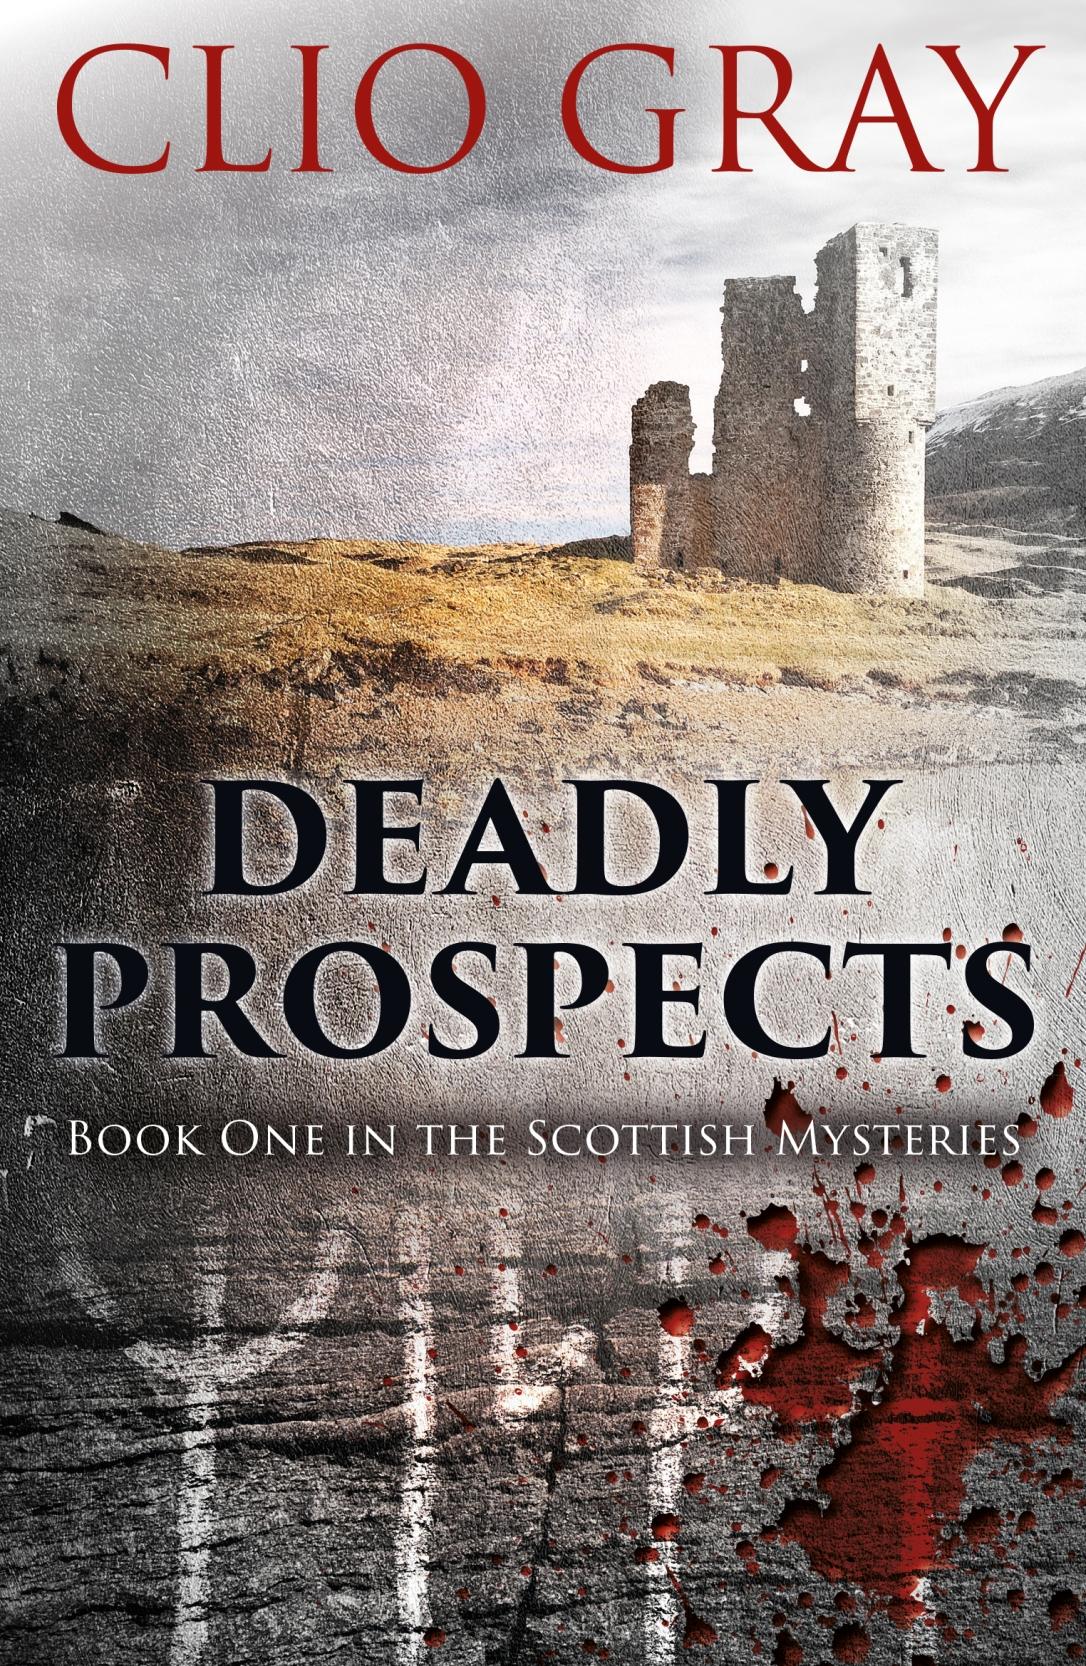 deadly prospects.jpg